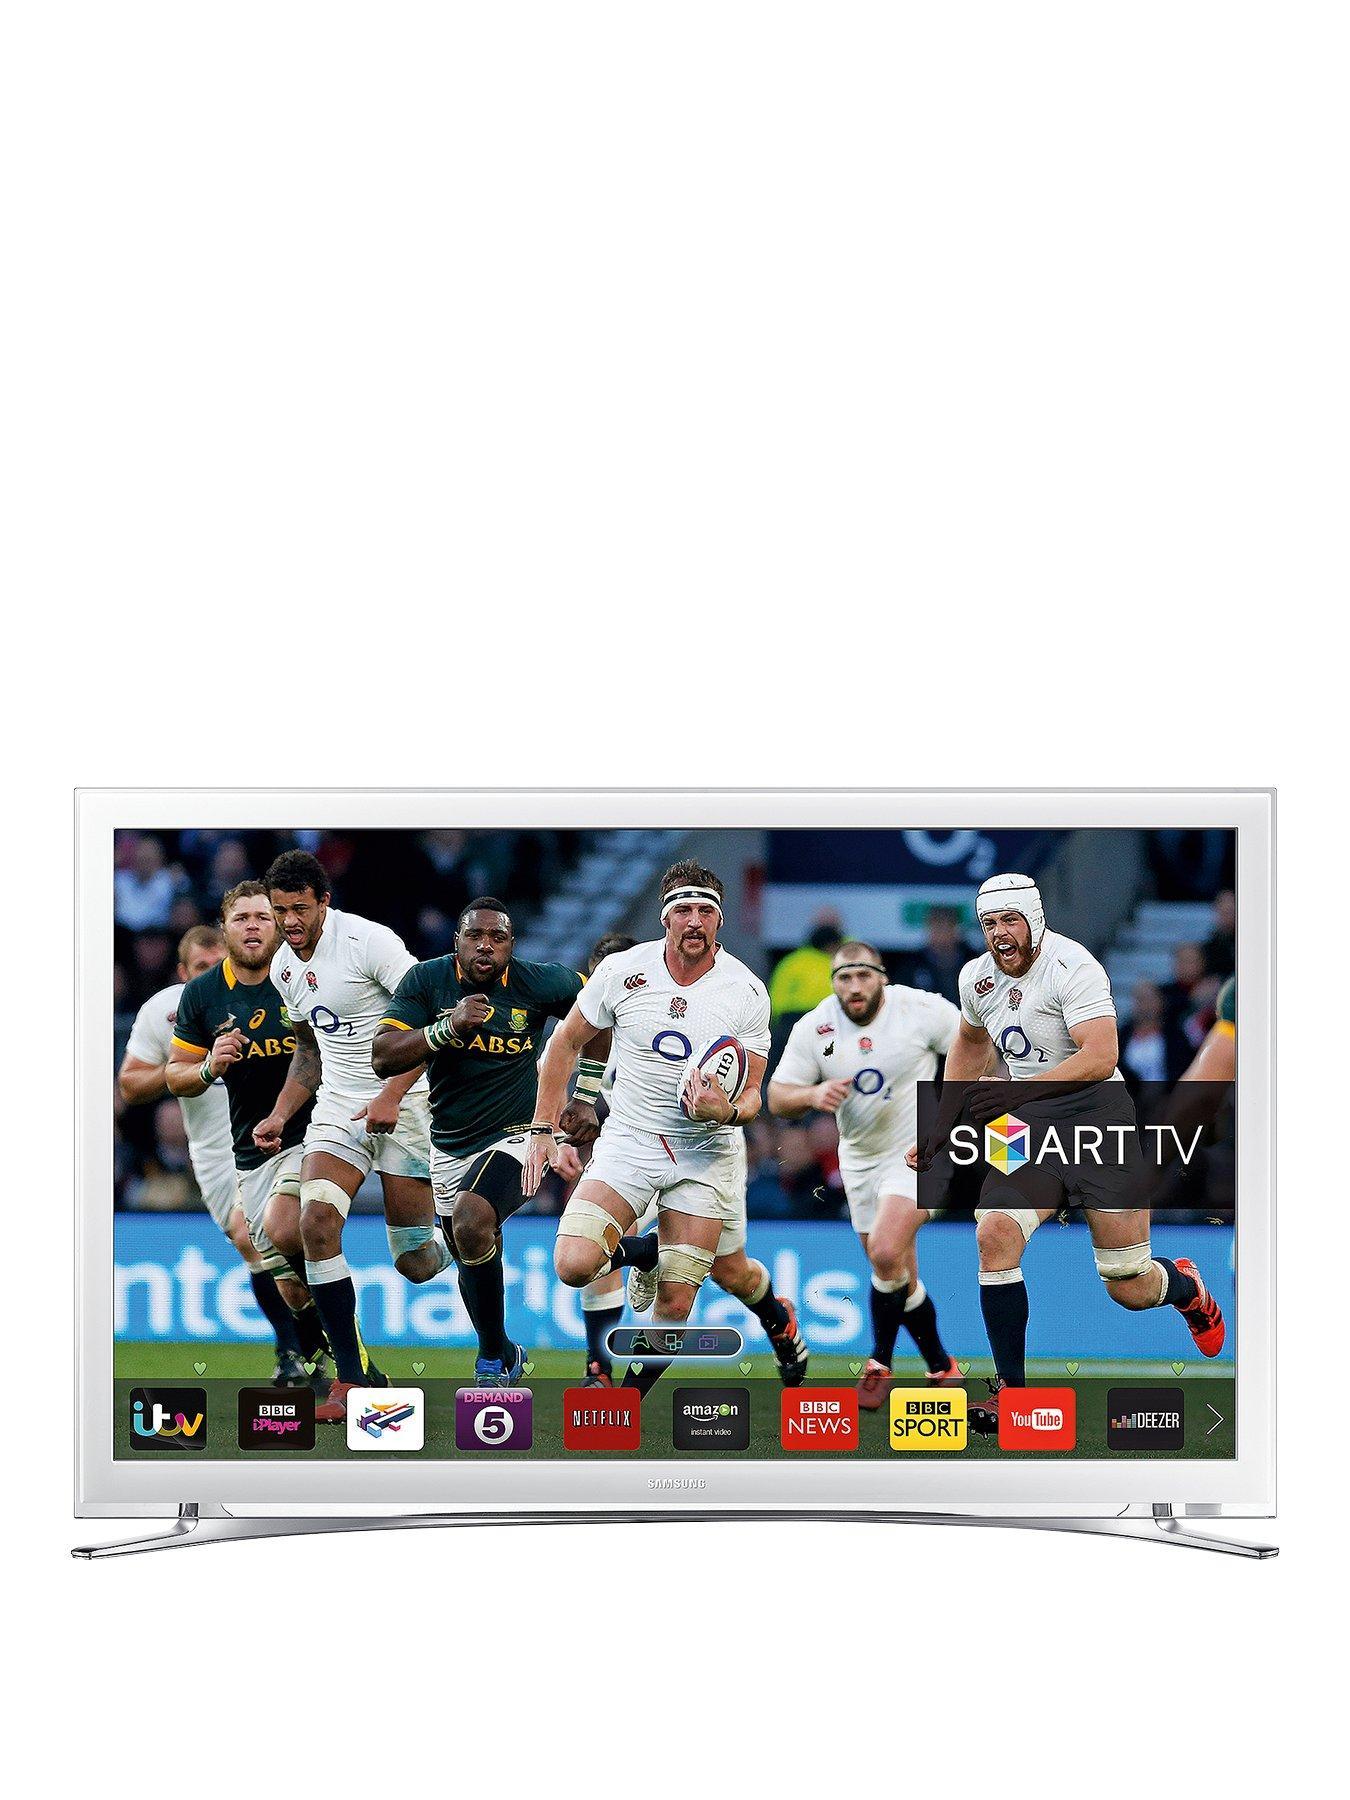 samsung tv deals. samsung ue22f5610 22 inch full hd smart led tv - white tv deals